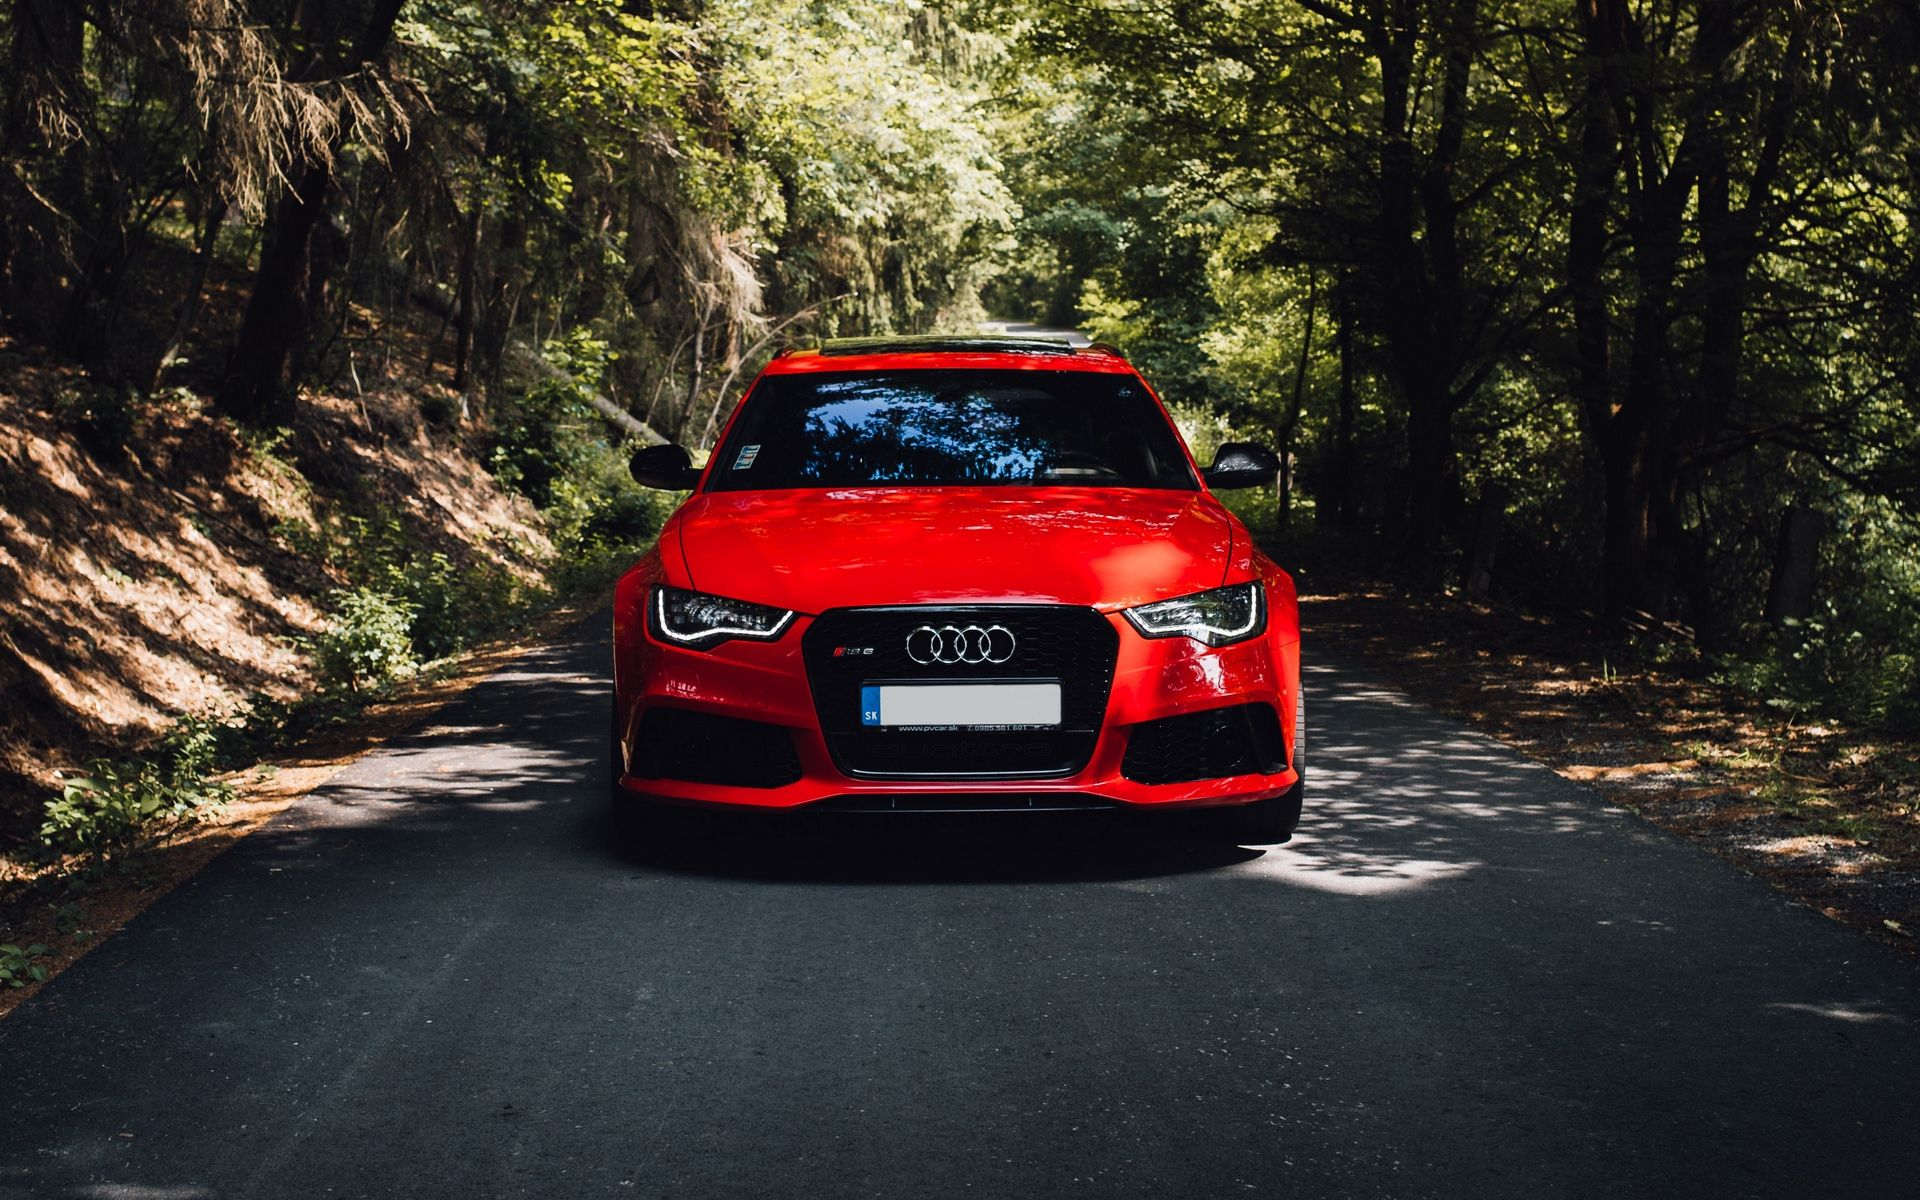 Audi A1 Sportback Wallpaper Hd Audi A1 Sportback Audi A1 Audi